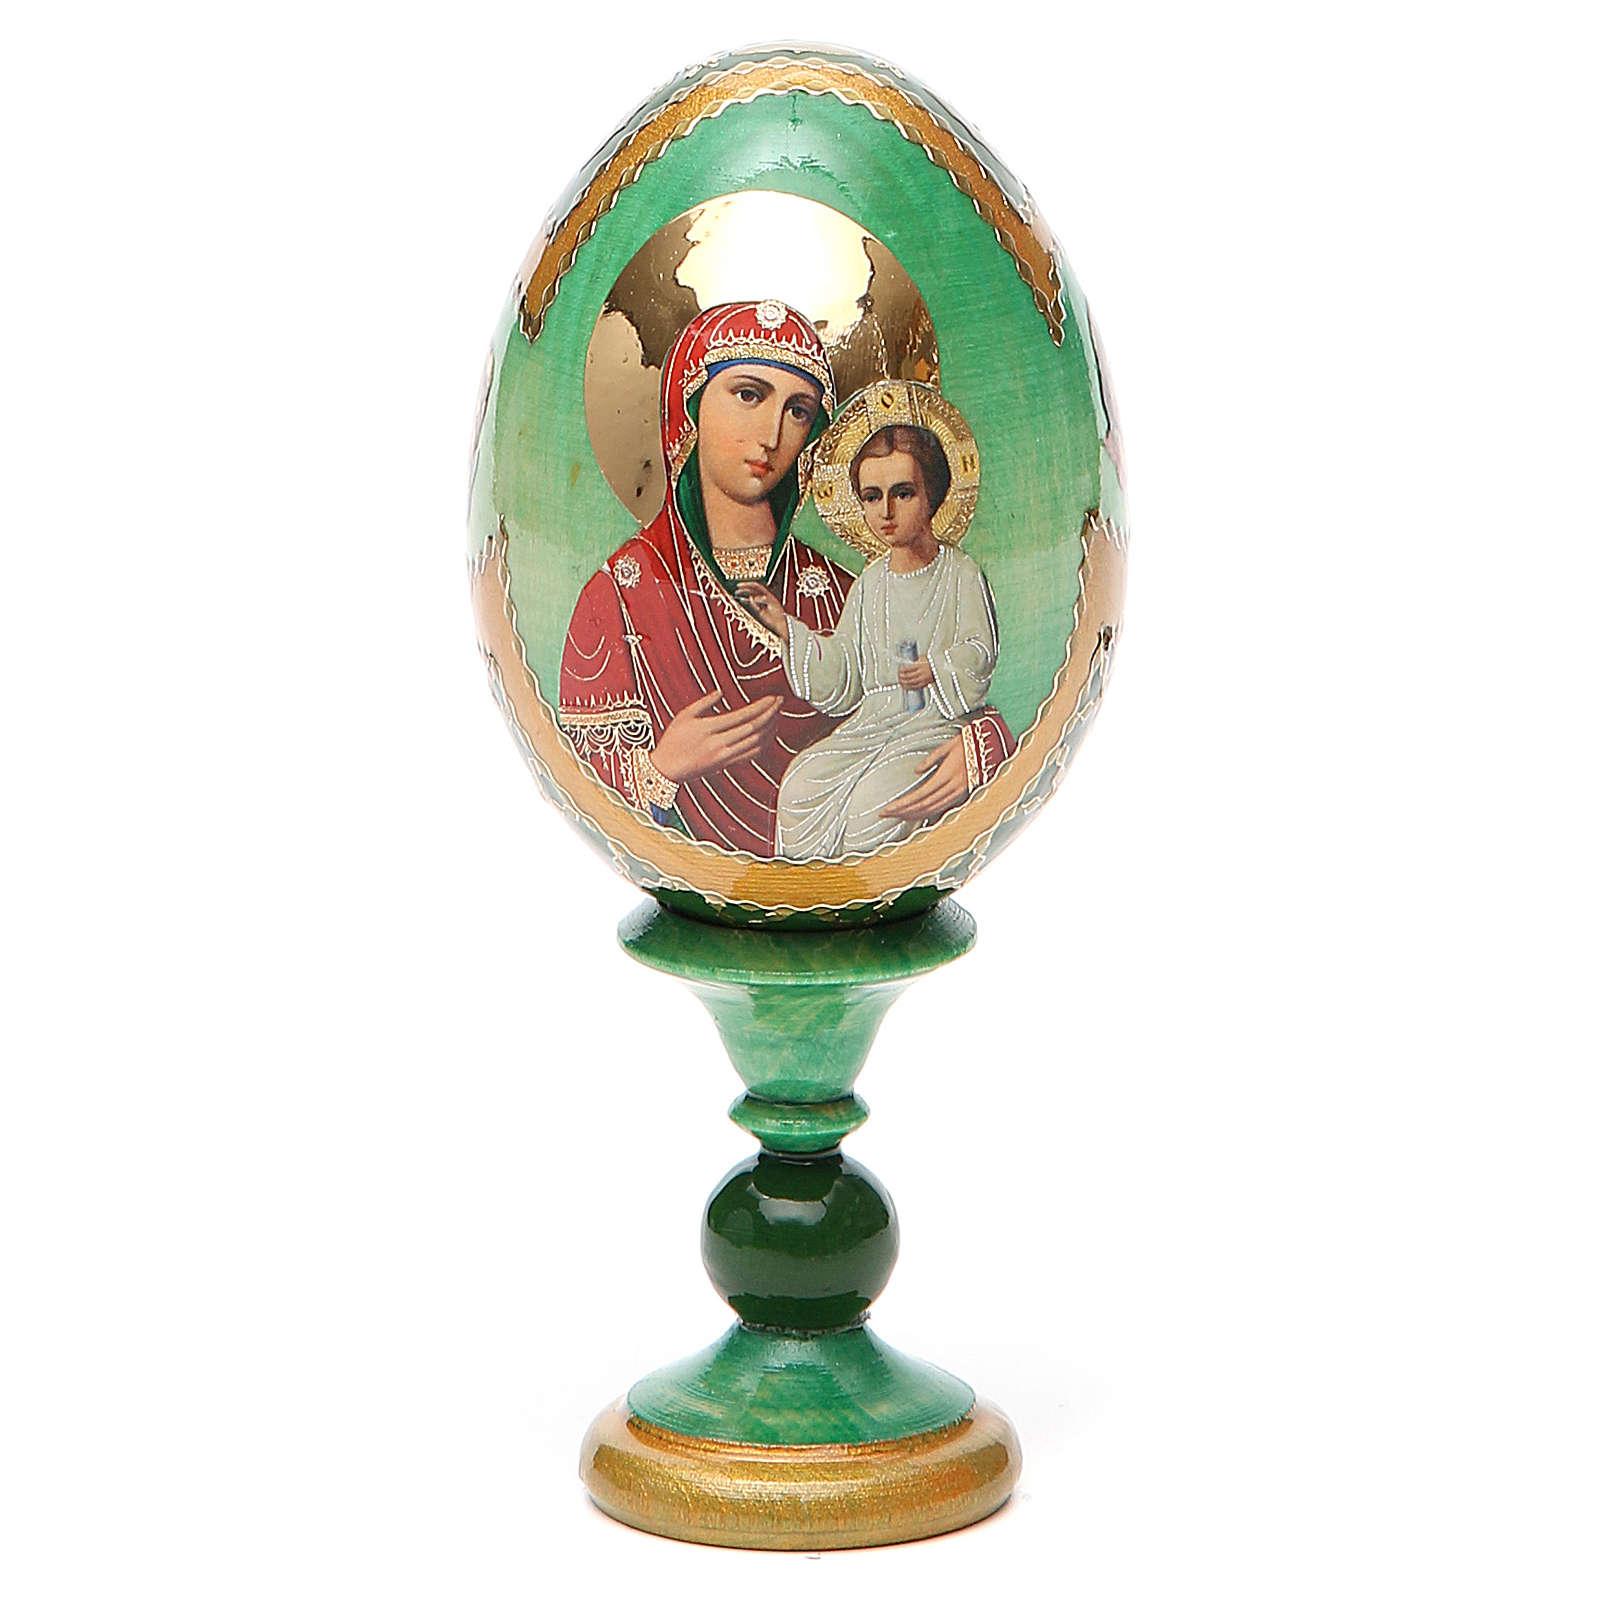 Uovo russo decoupage Smolenskaya h tot. 13 cm stile Fabergé 4